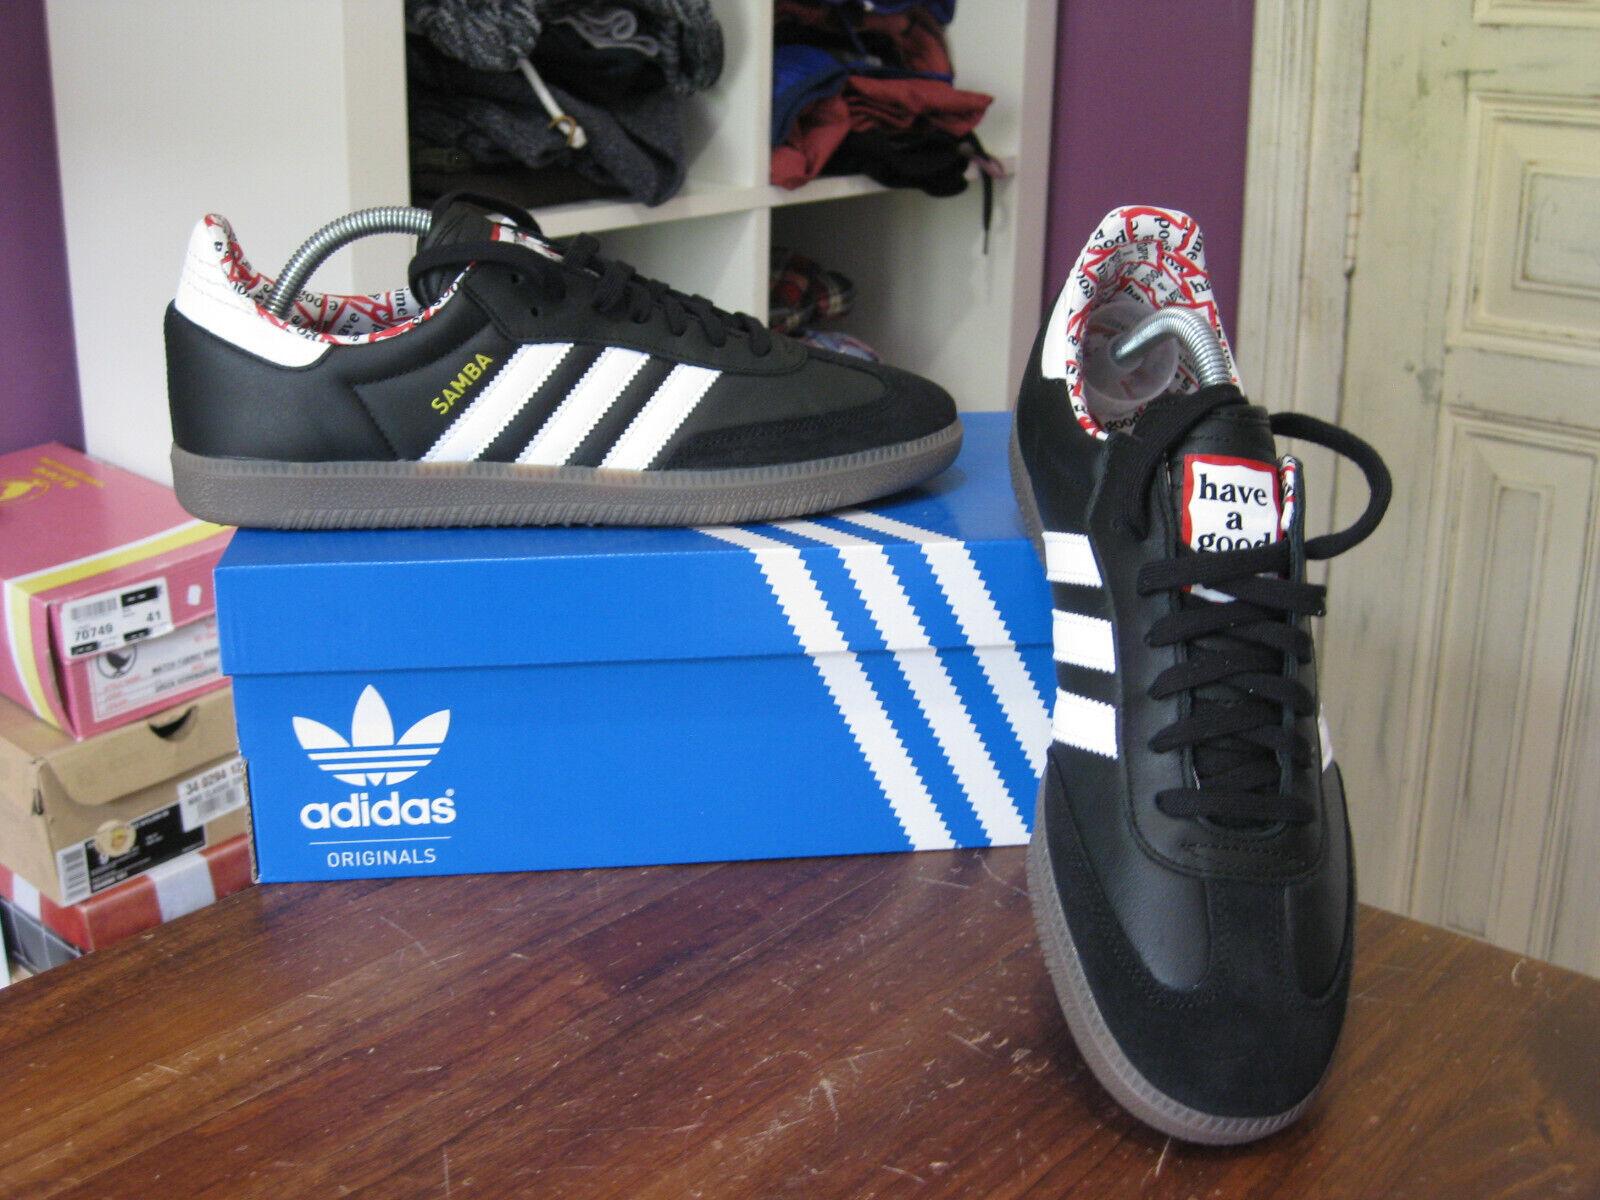 ZAPATILLAS ADIDAS SAMBA HAGT HAVE A GOOD TIME  UK8  LIMITED zapatos